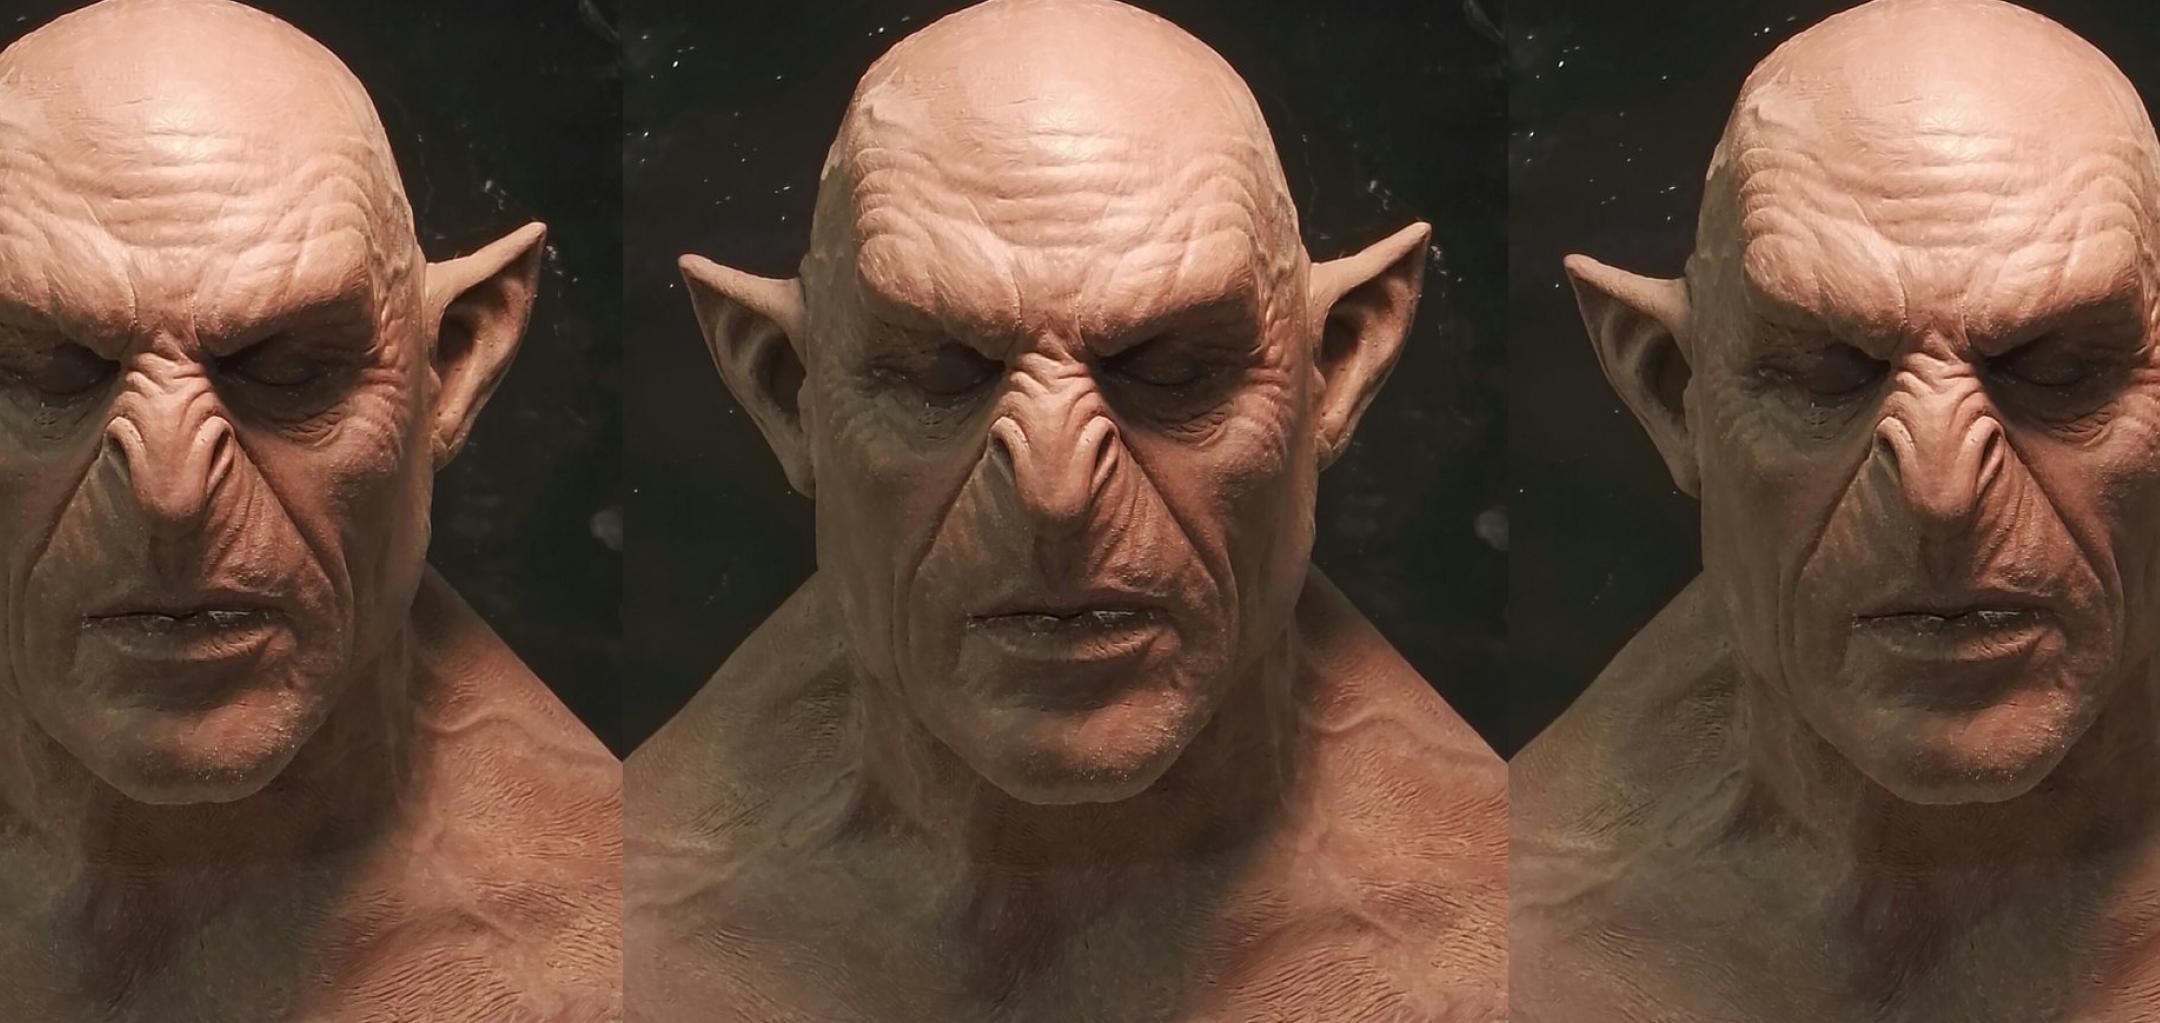 BTS Hero image - Shadow of War facial prosthetic - Courtesy Neil Huxley.jpg